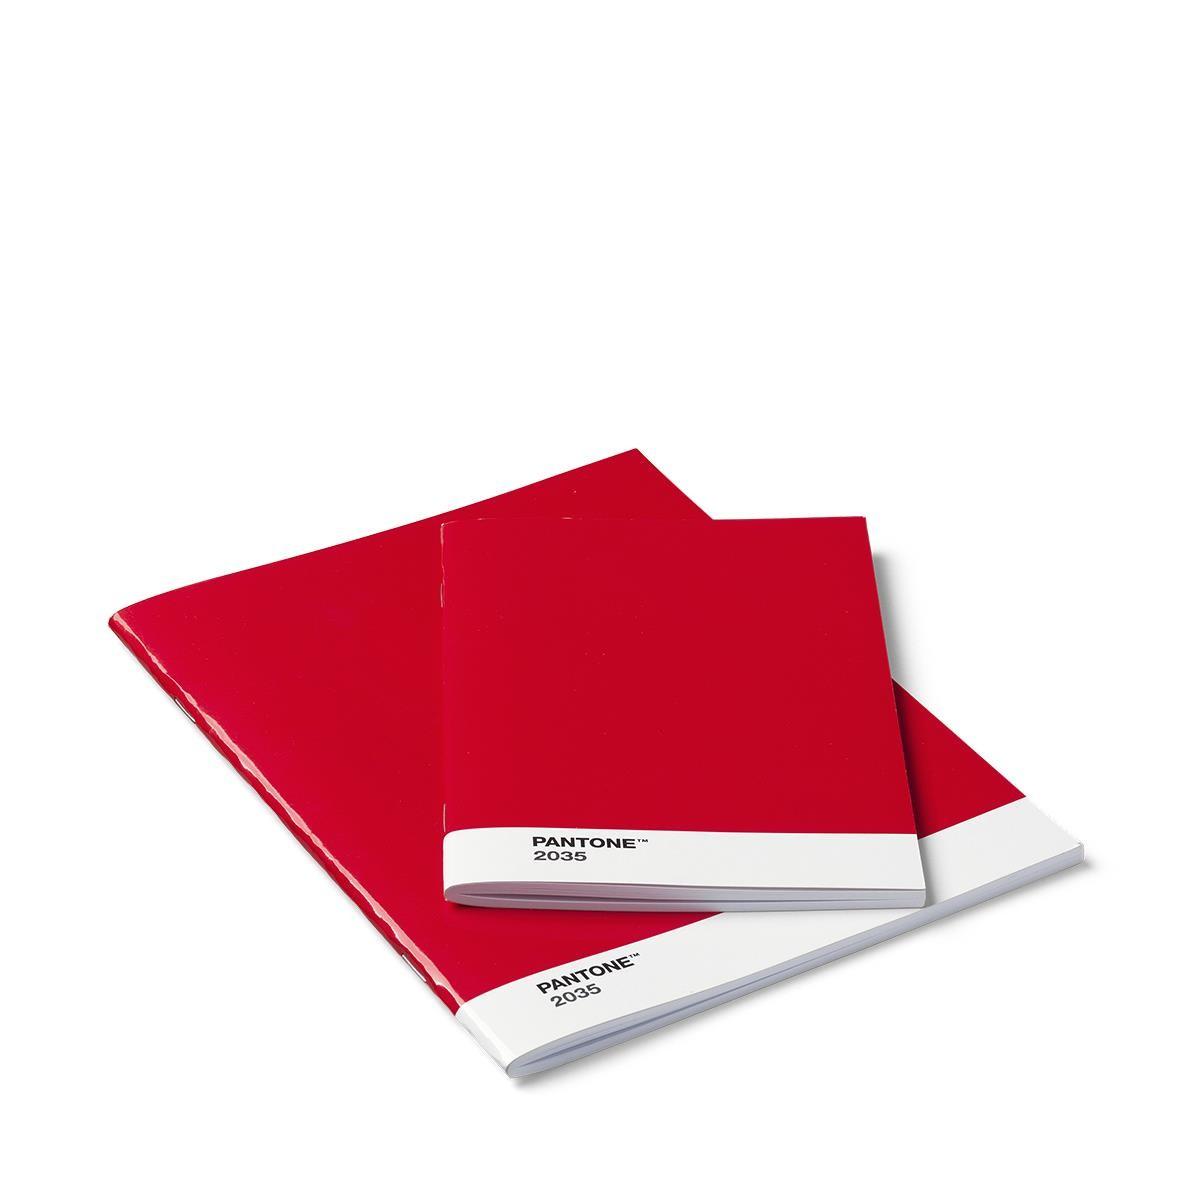 Hefte Blanko 2 Stück Rot 2035 Set Von 12 Stück Pantone Büro Produkte